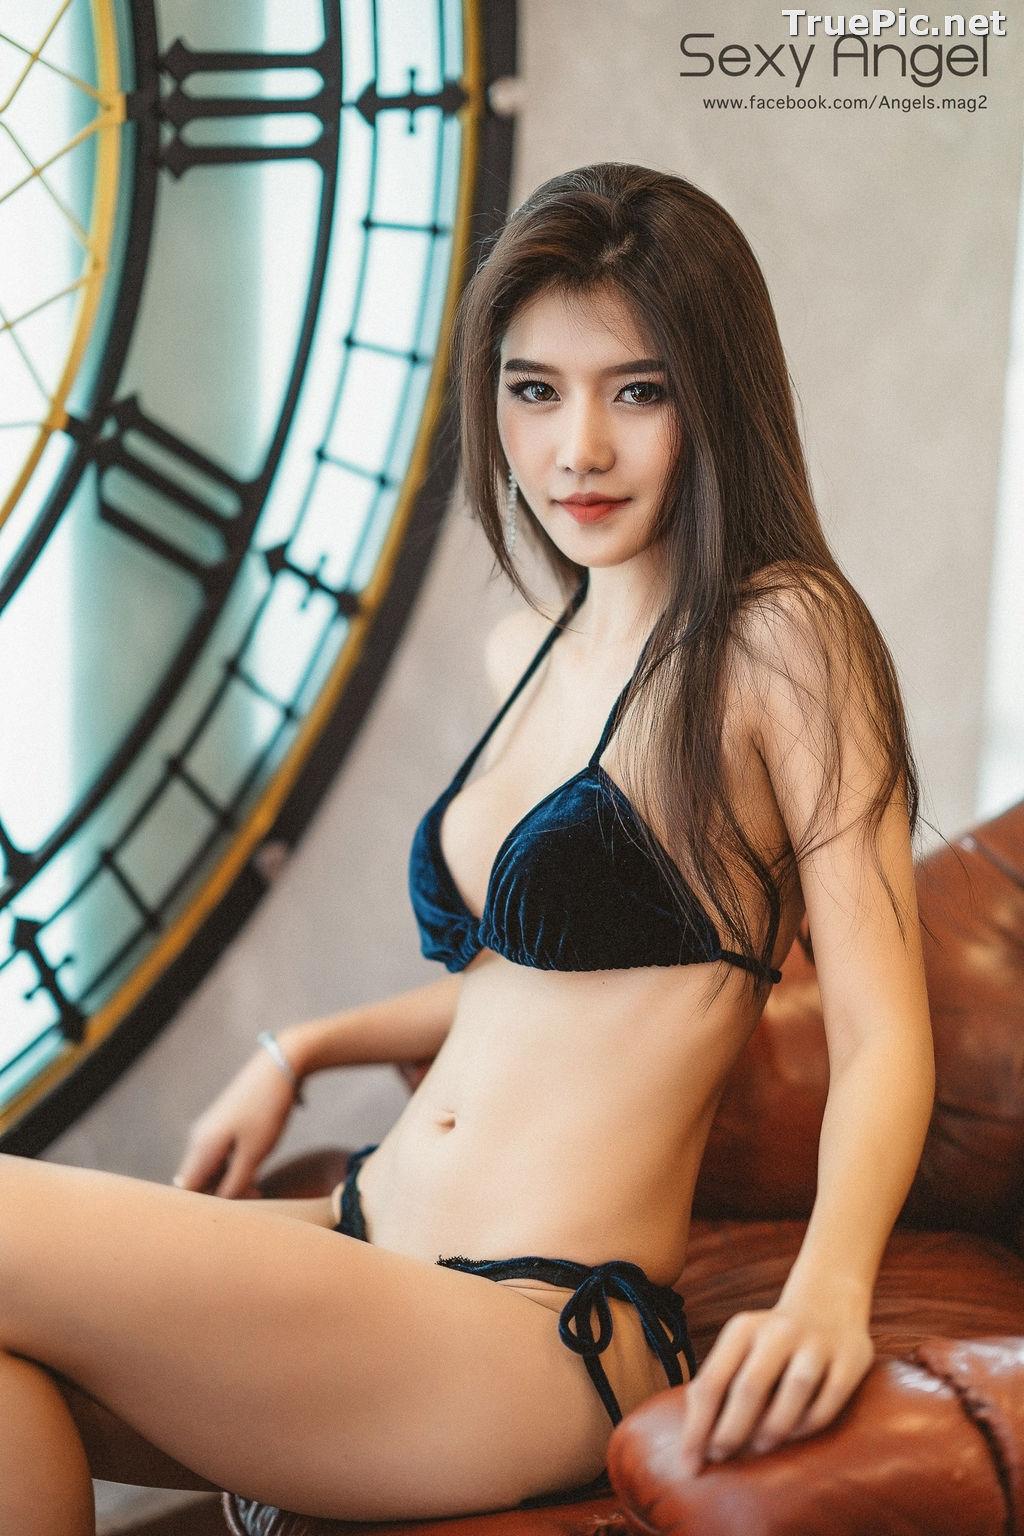 Image Thailand Model - Saruda Chalermsaen (EveAva) - Sexy Bikini Angel - TruePic.net - Picture-5